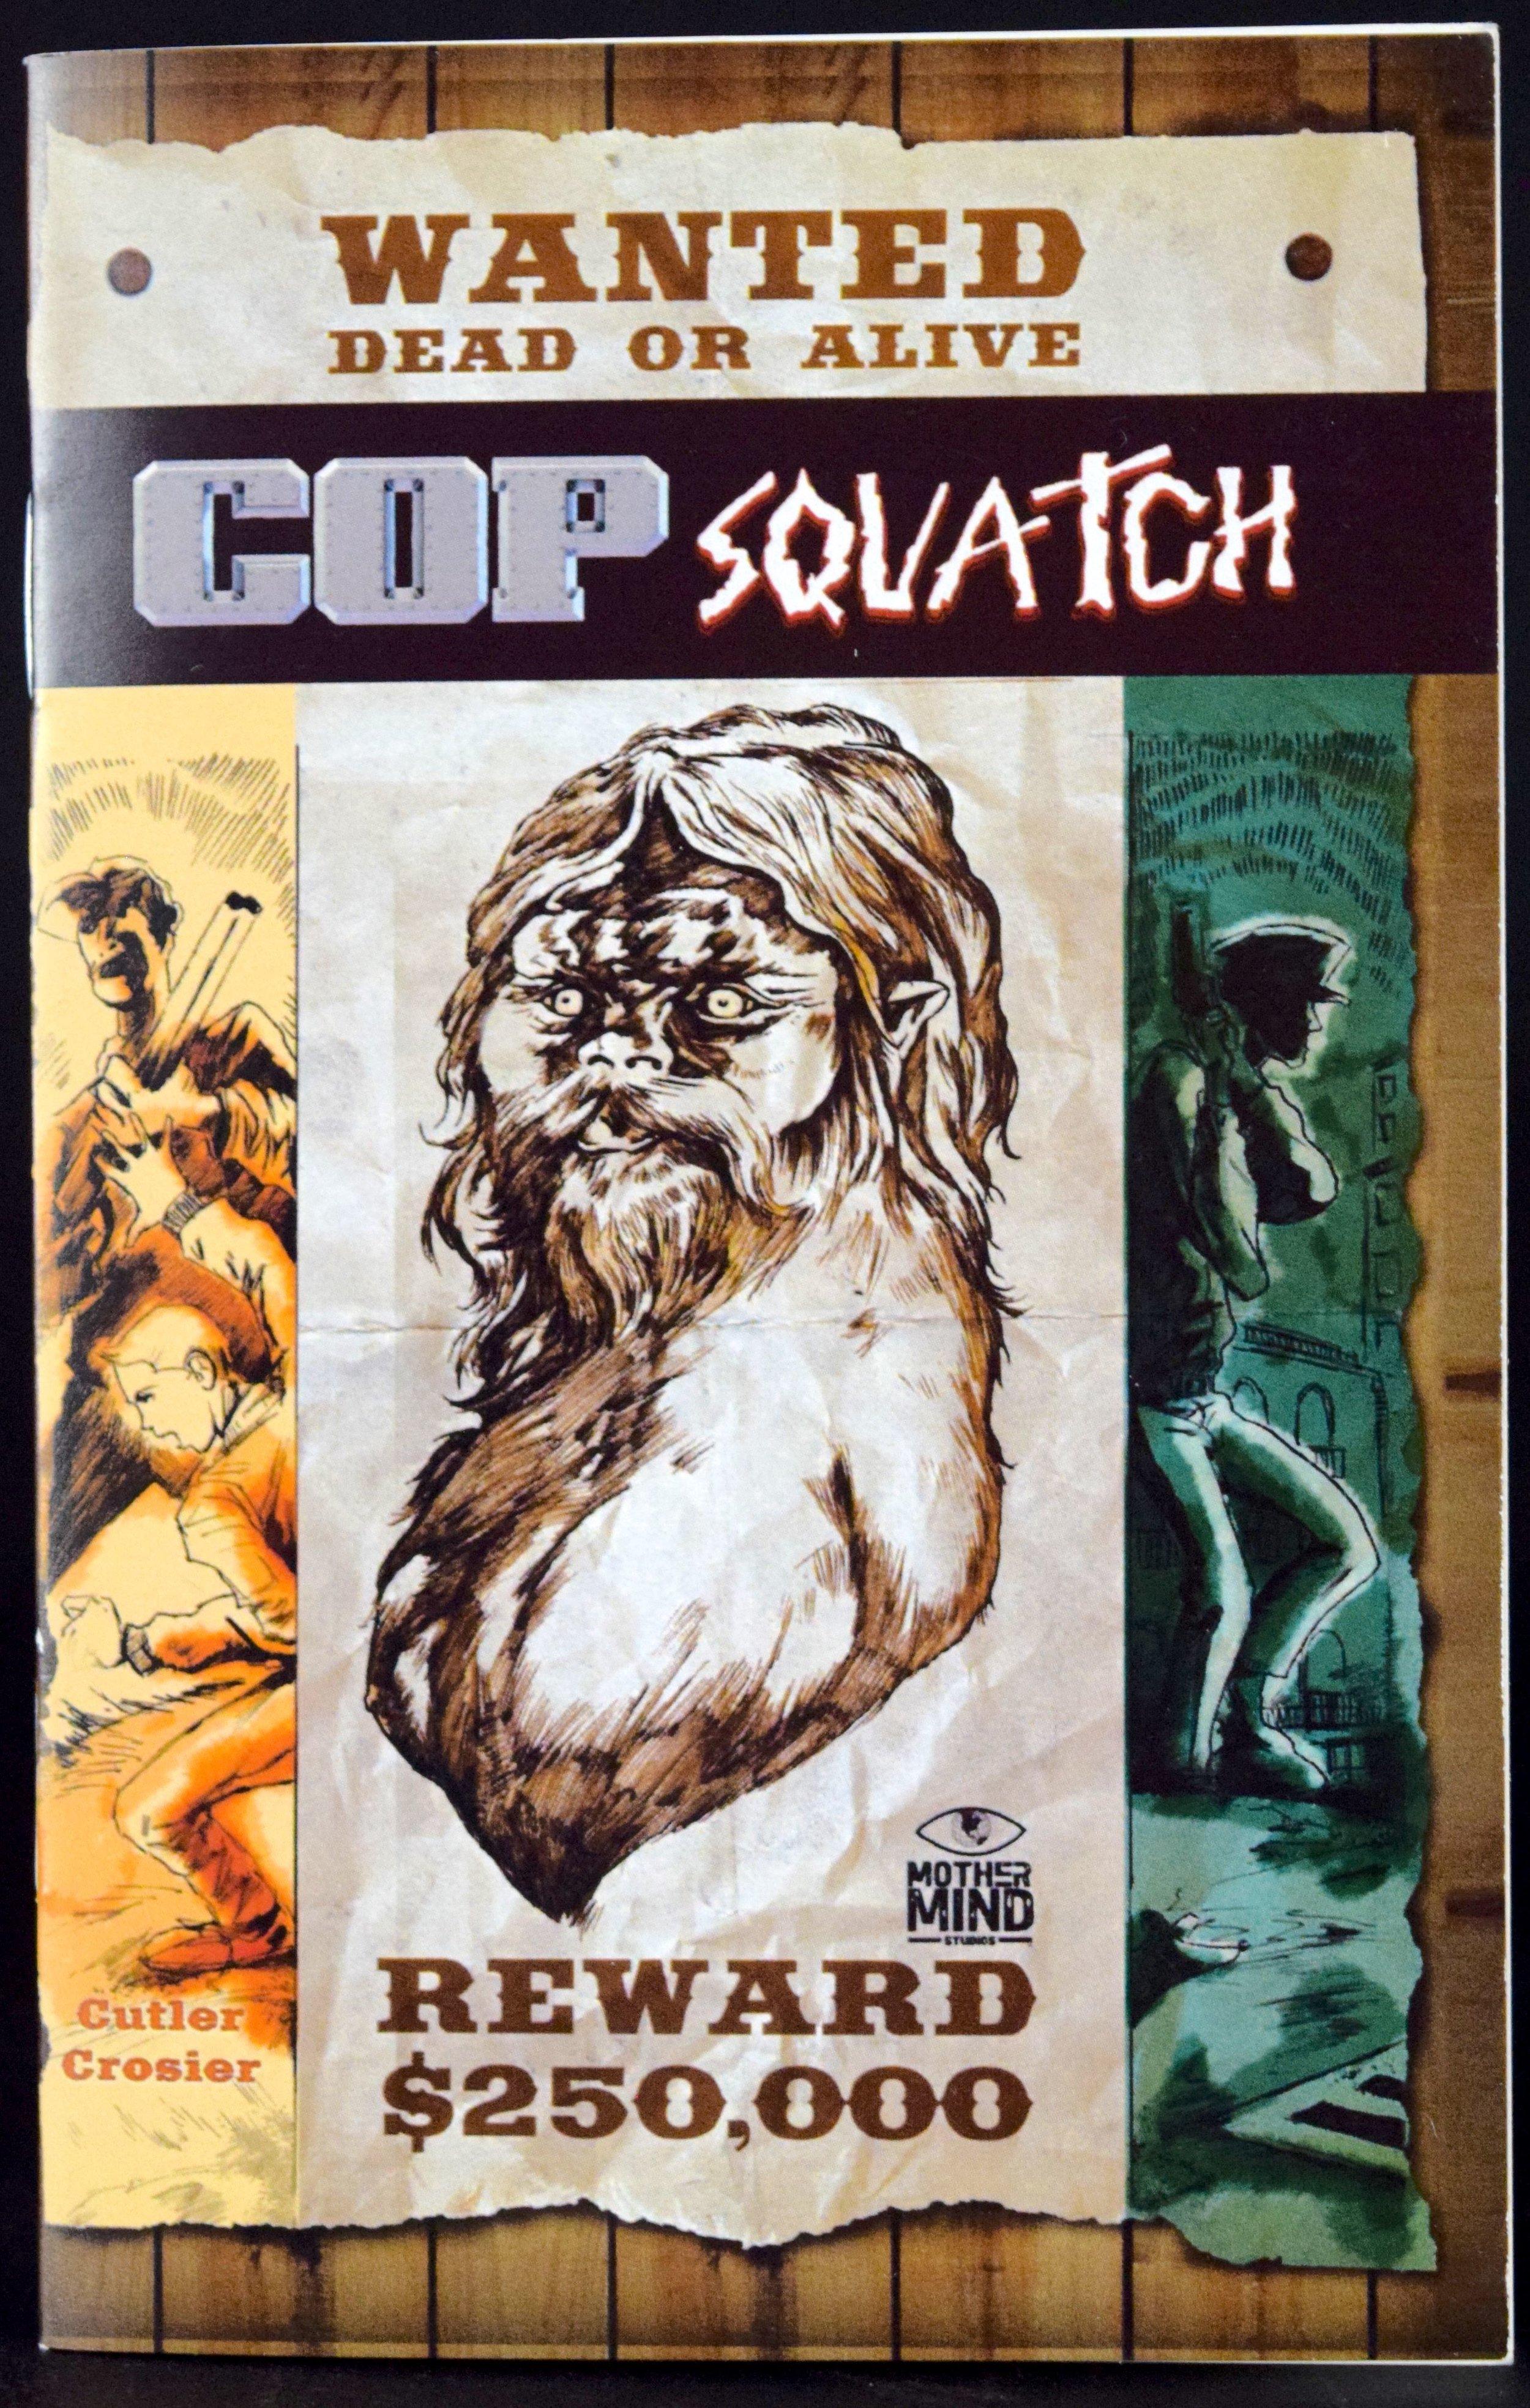 CopSquatch  mini-comic by  Allan Elijah Cutler  &  Daniel Crosier .